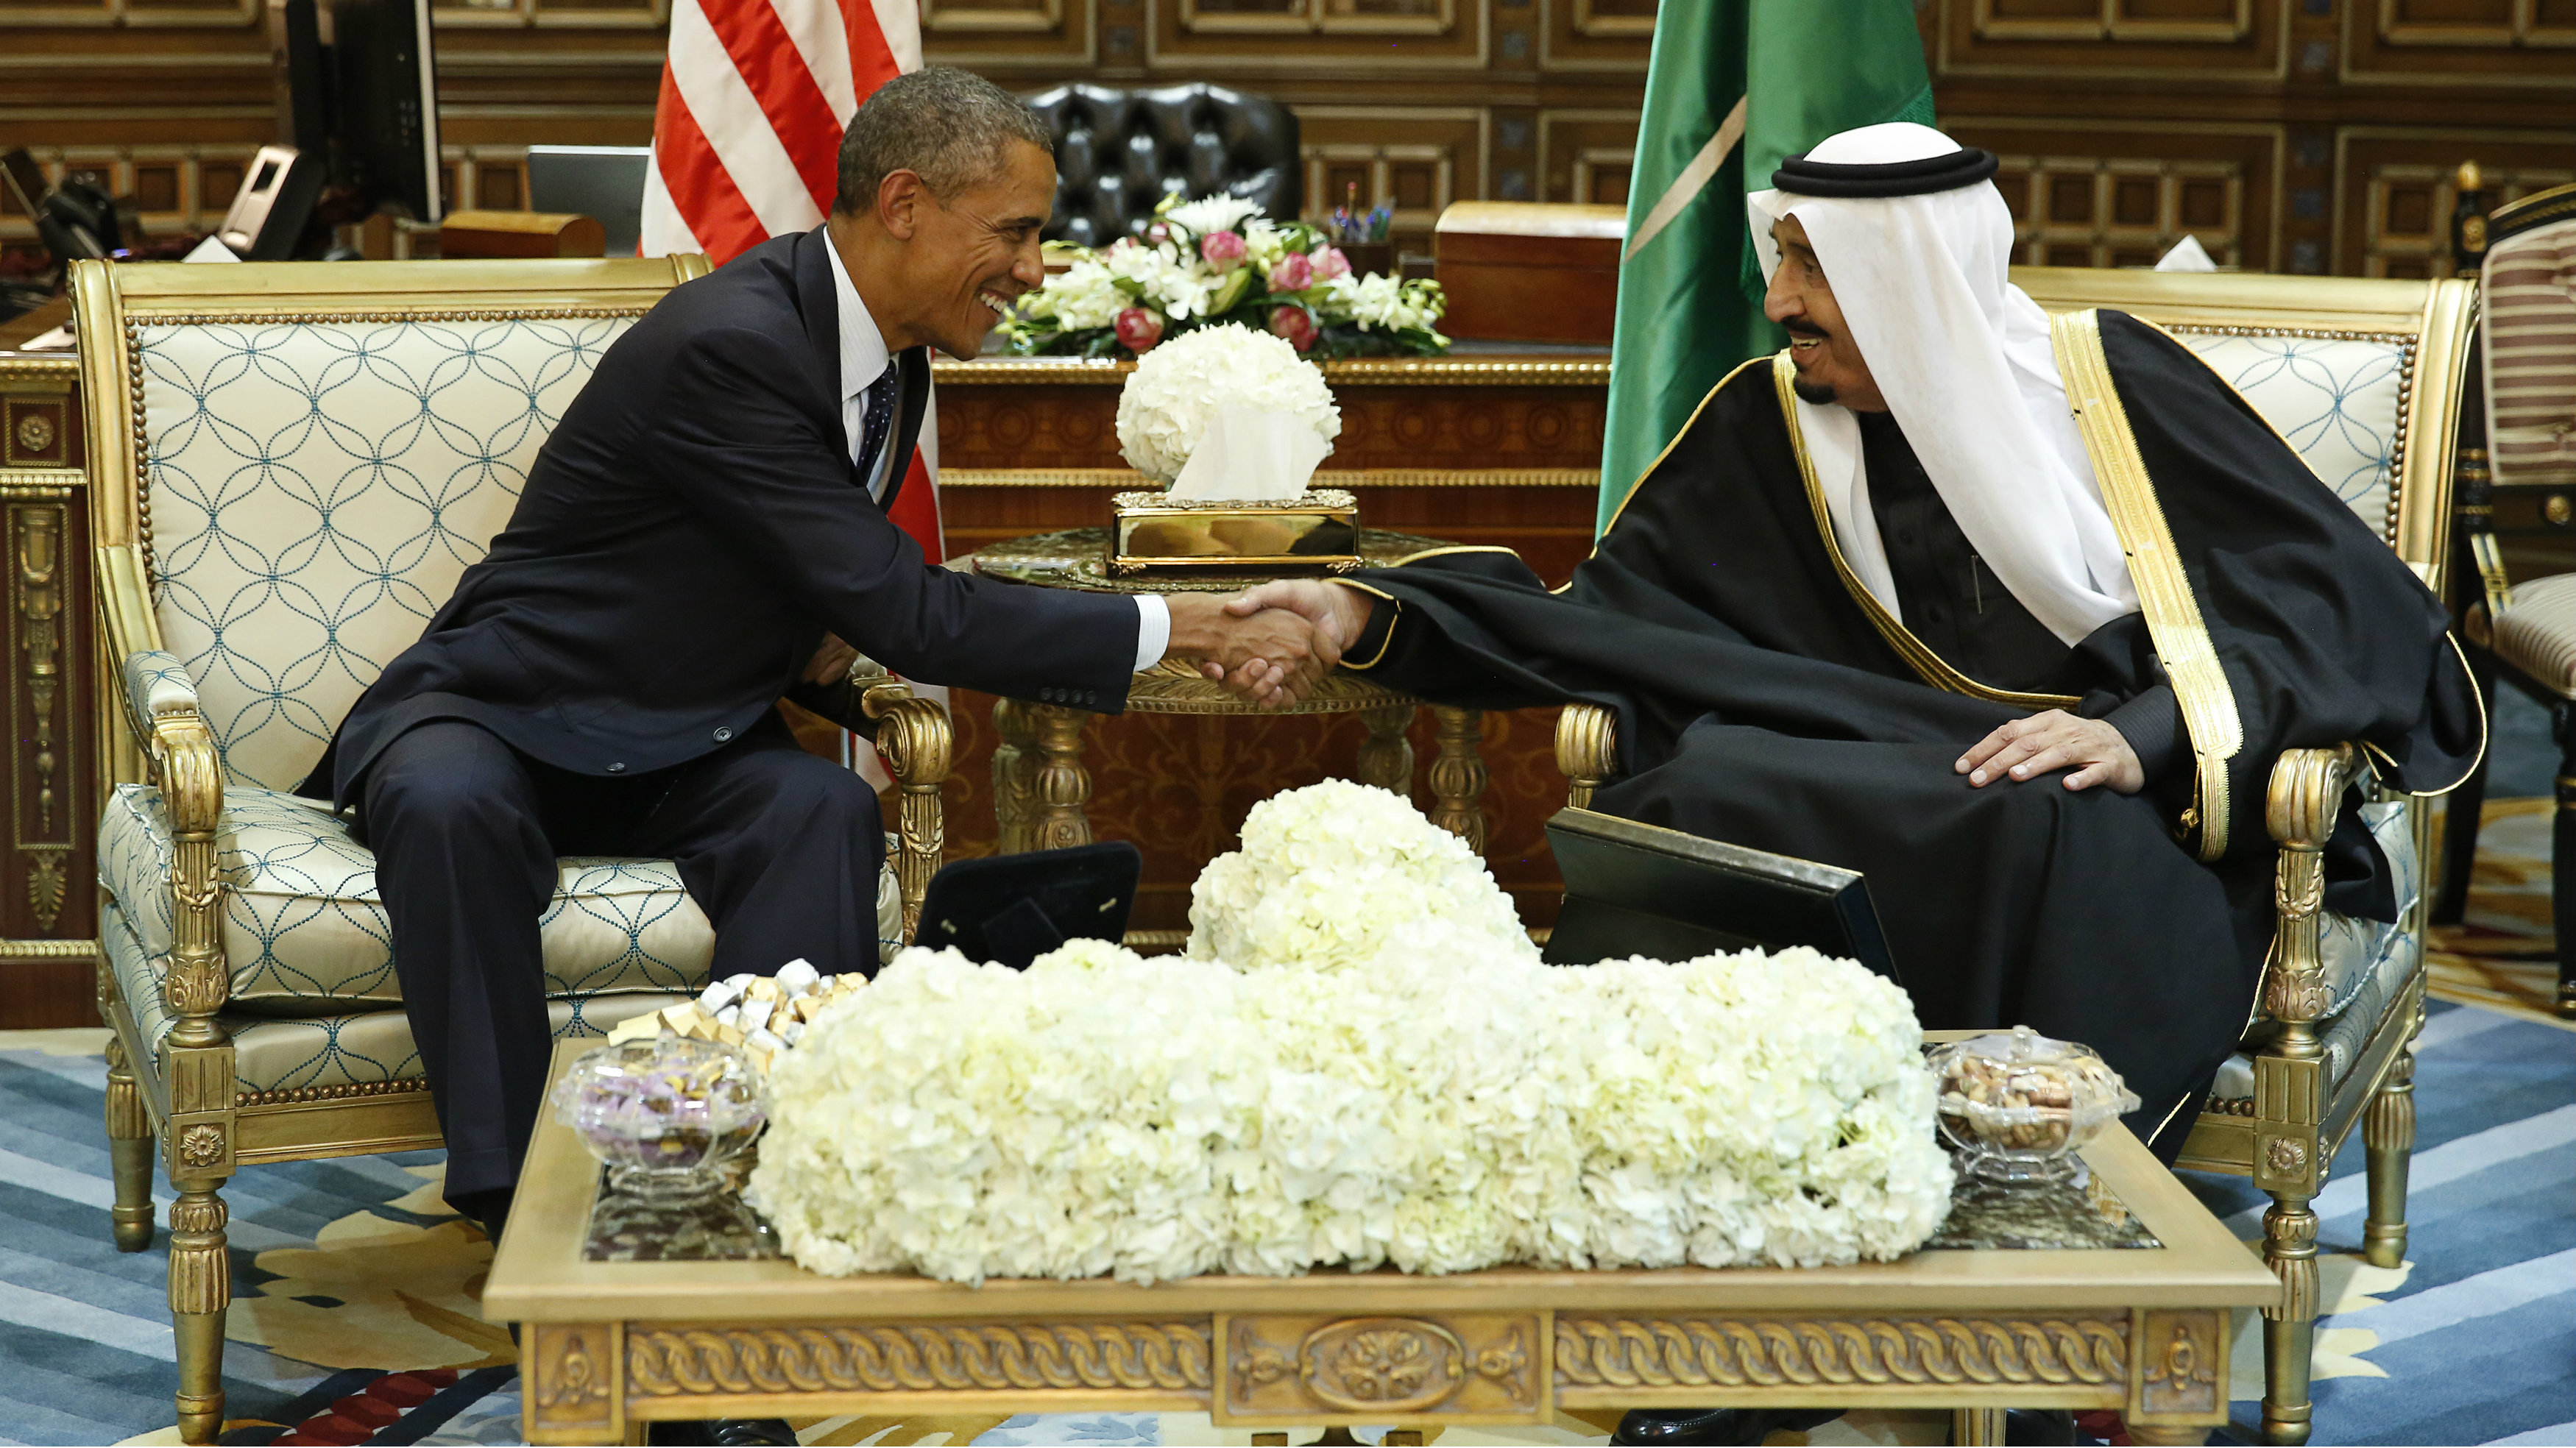 U.S. President Barack Obama (L) shakes hands with Saudi Arabia's King Salman at the start of a bilateral meeting at Erga Palace in Riyadh January 27, 2015.